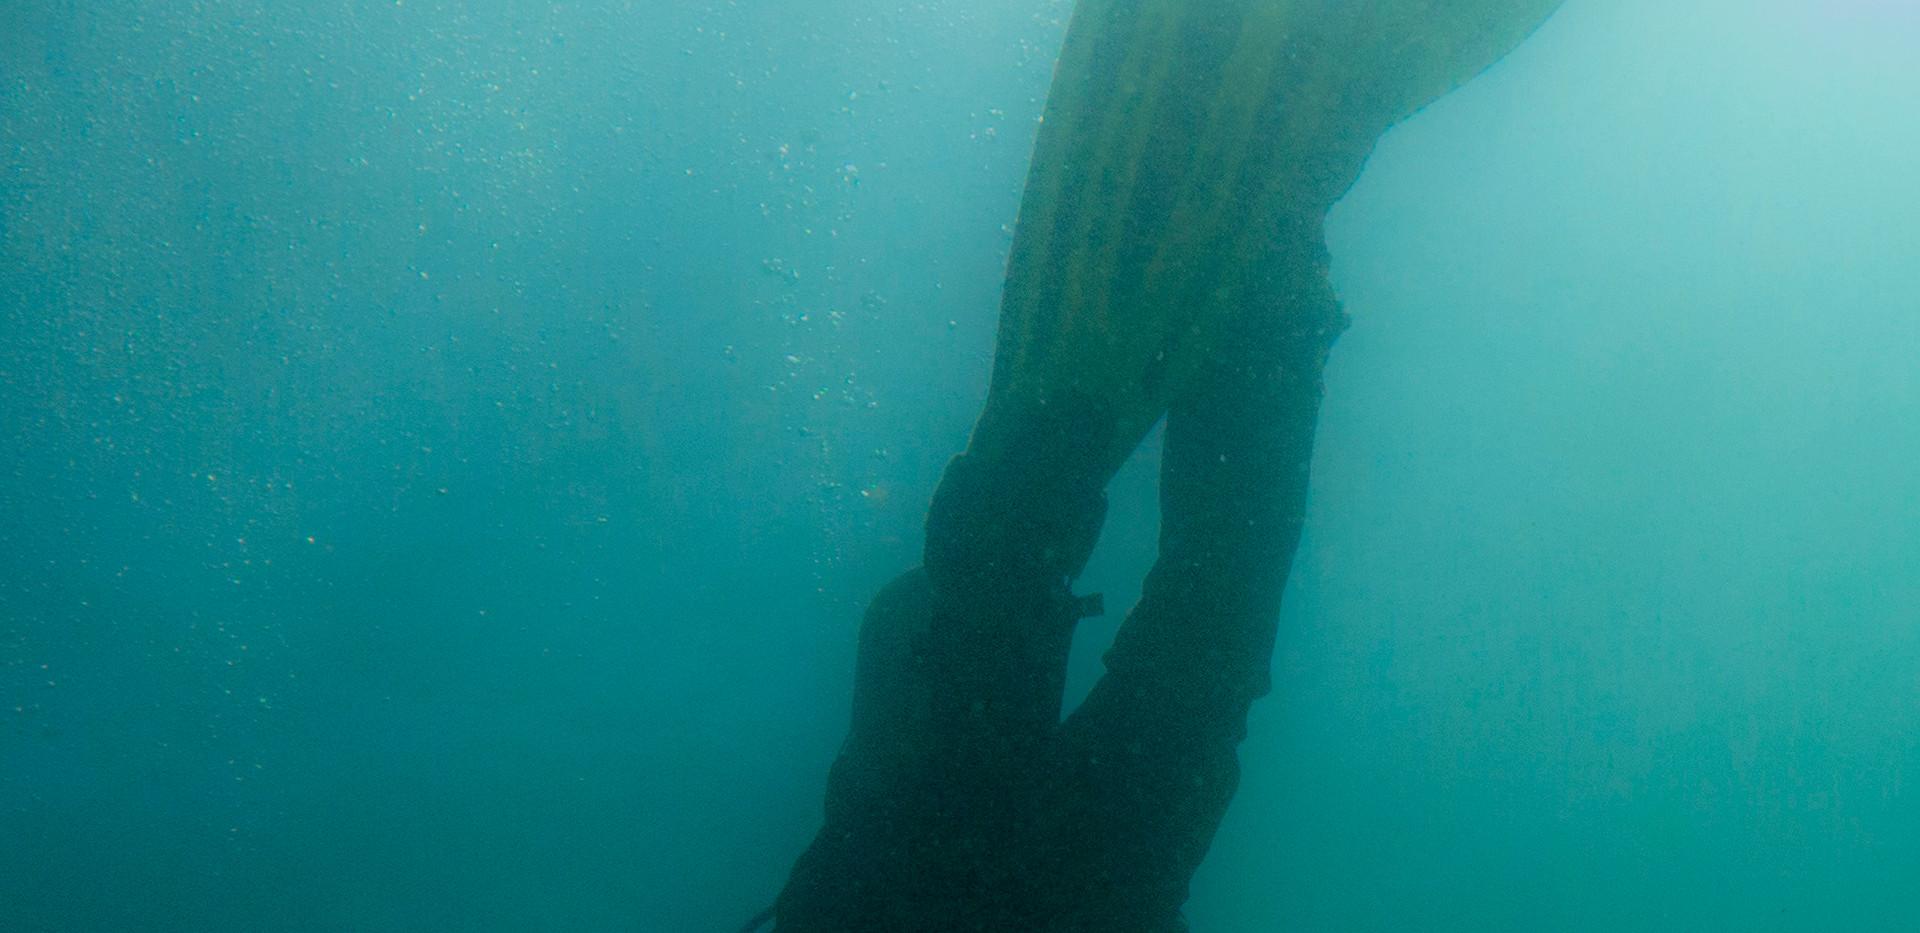 Bahía inglesa 23